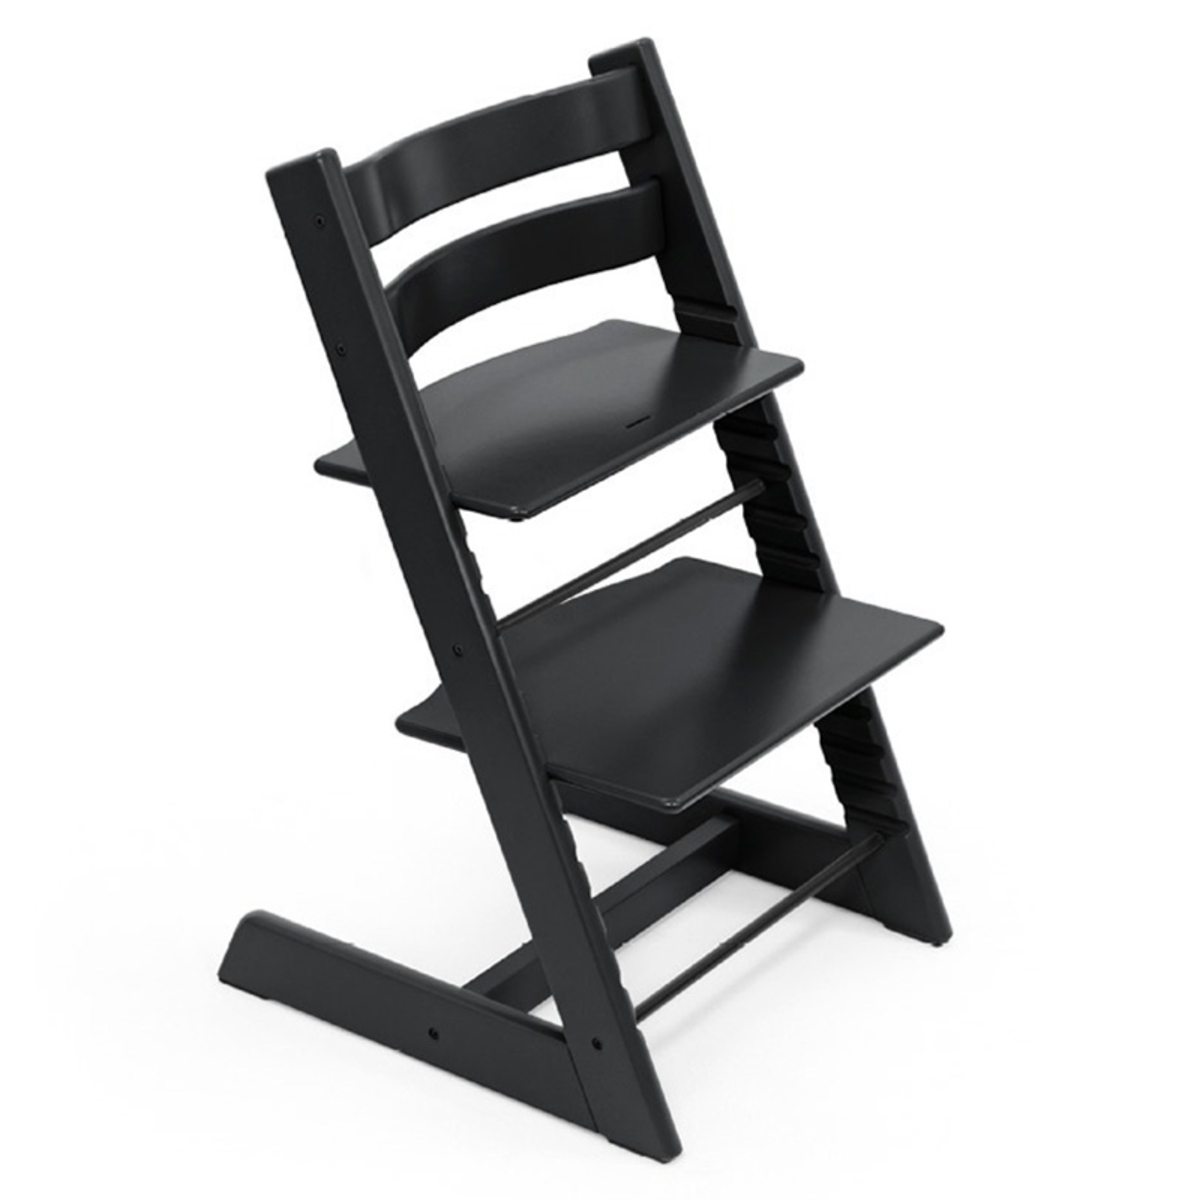 Chaise haute Chaise Haute Tripp Trapp - Noir Chaise Haute Tripp Trapp - Noir